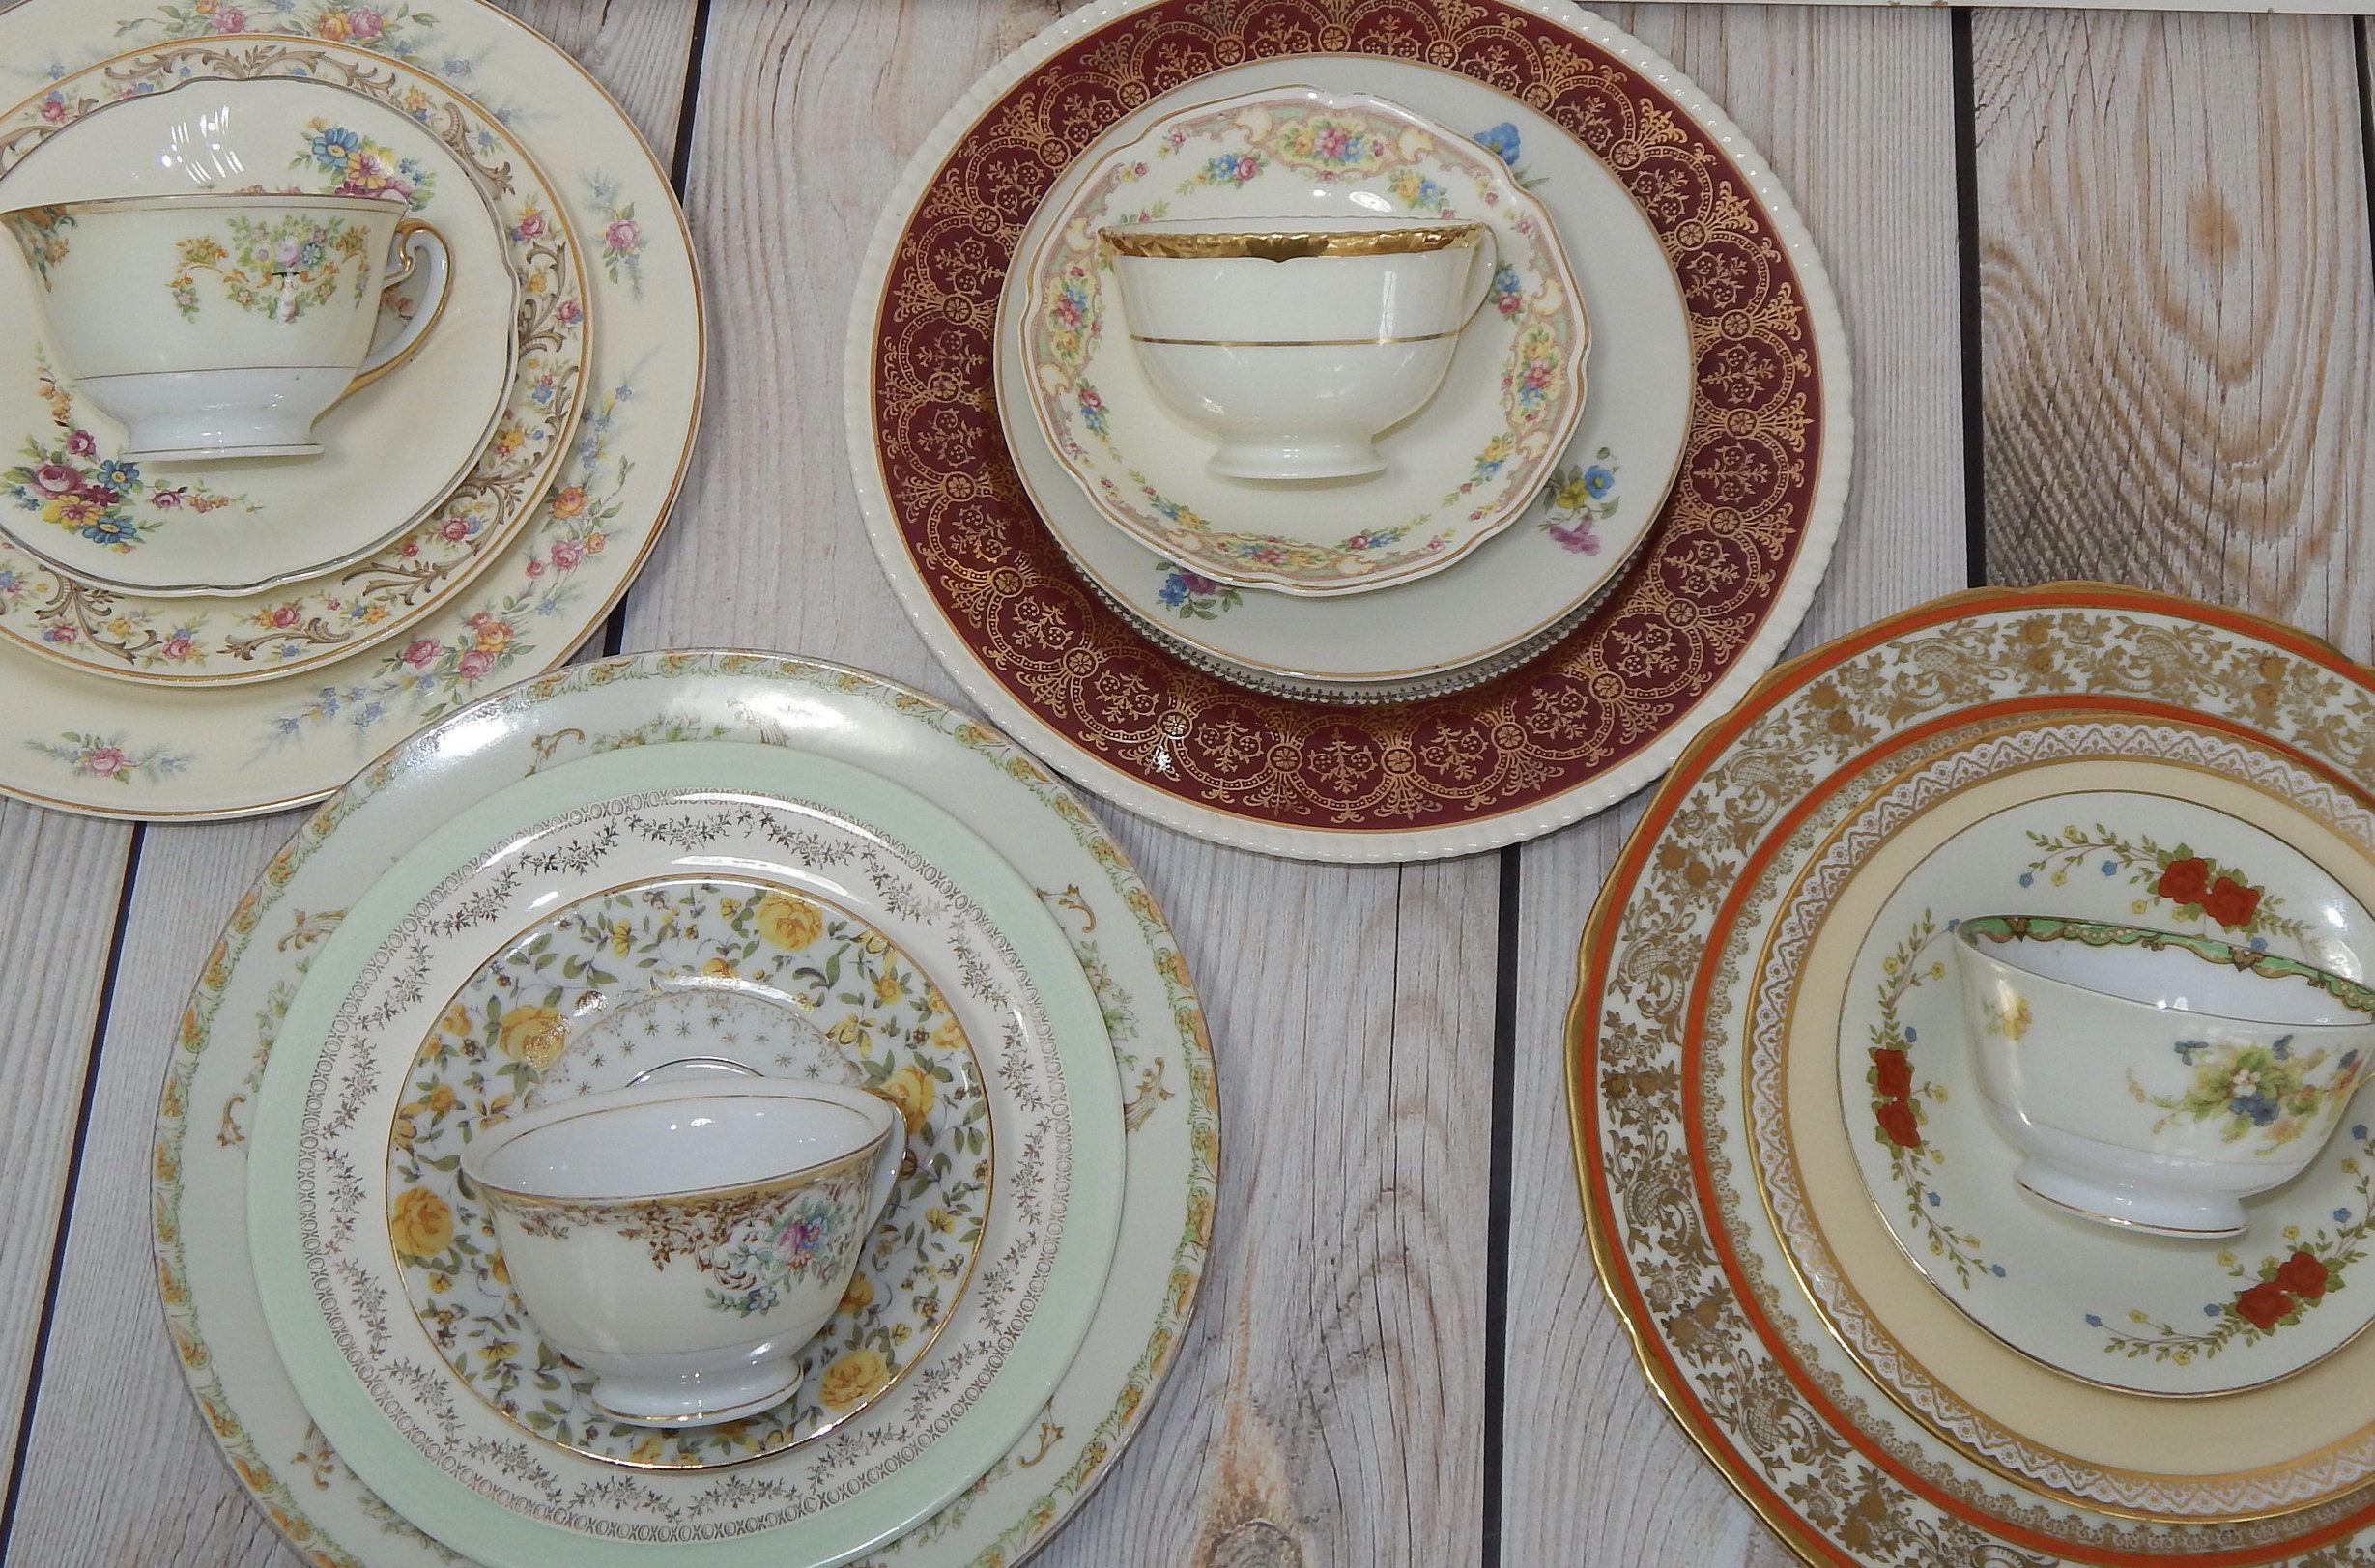 Mismatched Dinnerware Set 16 Pc Vintage China Dinner Plates